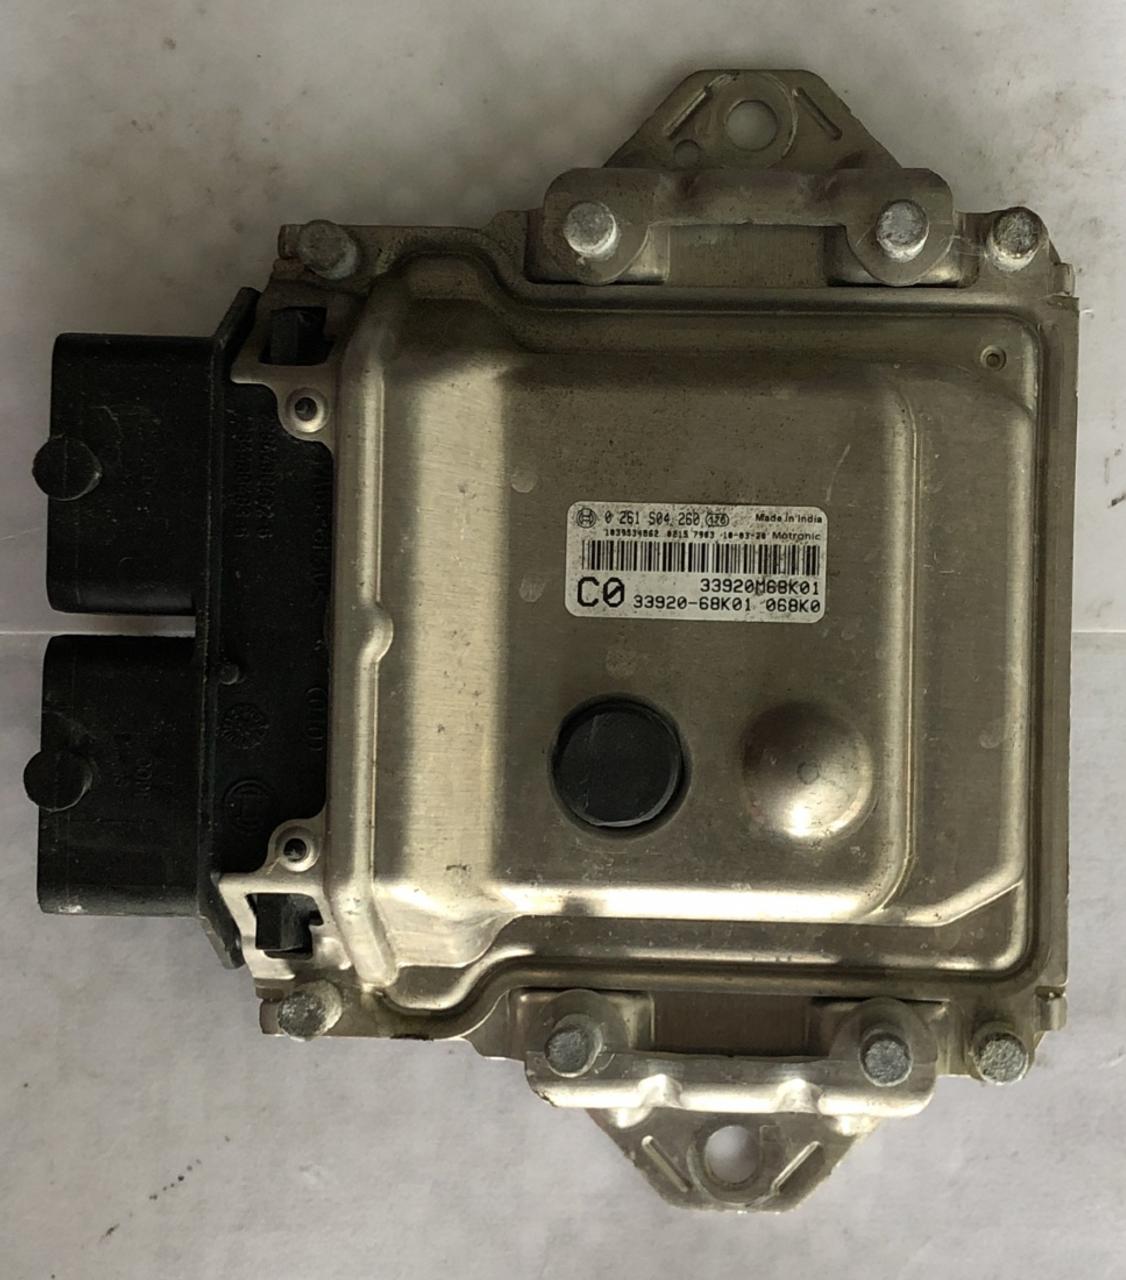 Suzuki Alto 1.0, 0261S04260, 0 261 S04 260, 33920-68K01